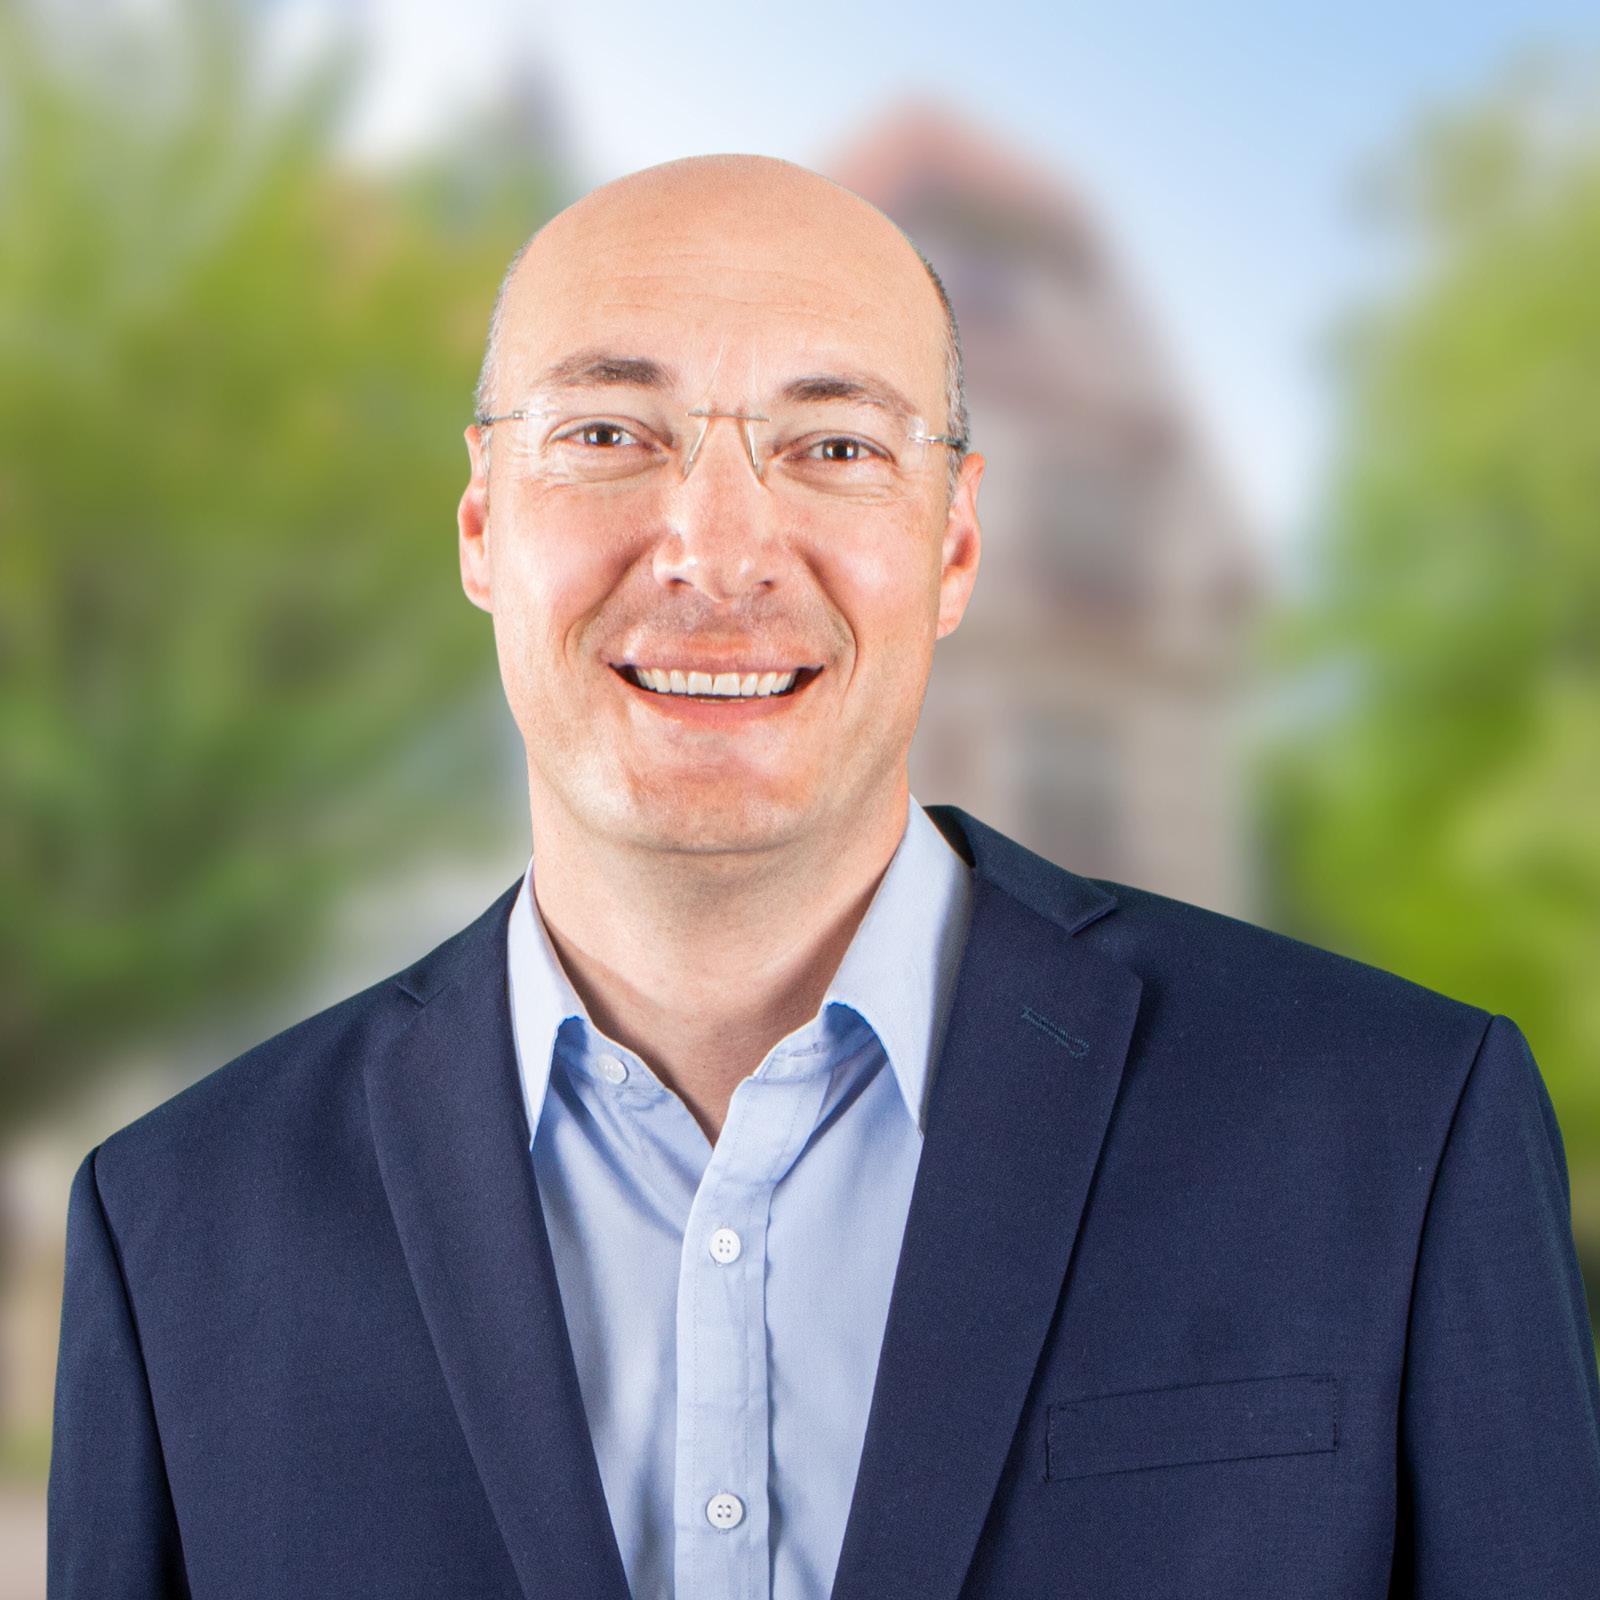 Abbildung von Dr. Timo Czech